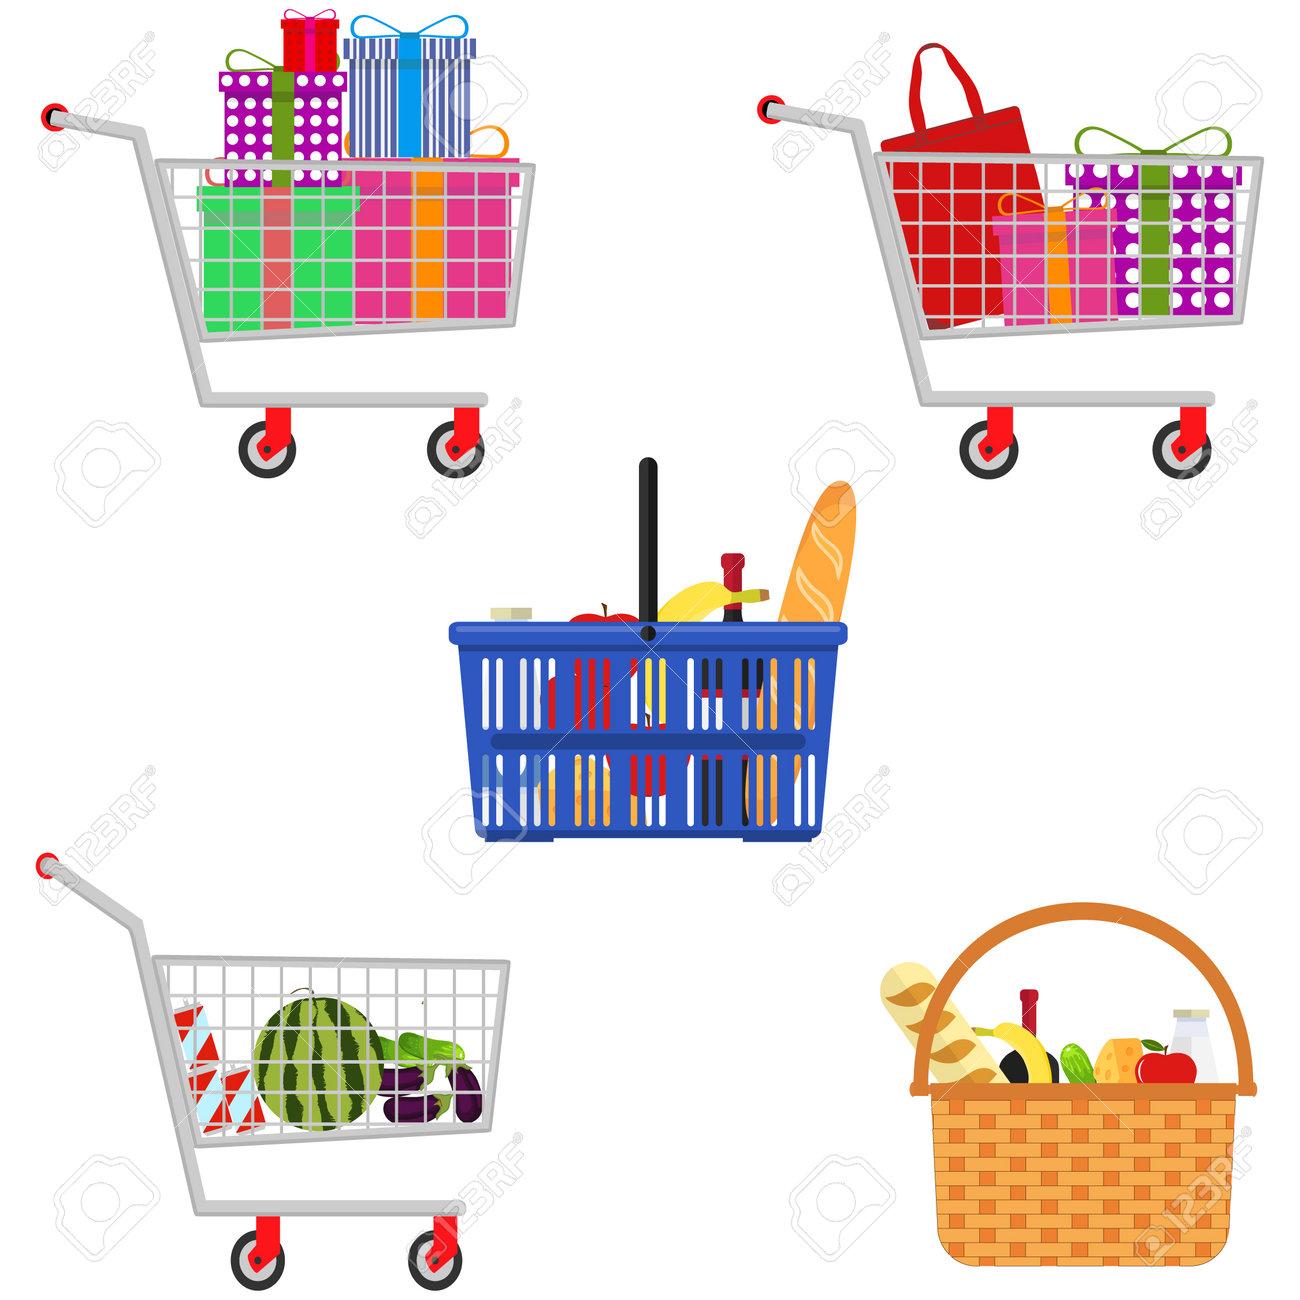 Shopping basket, shopping trolley, shopping bag set. Vector illustration Vector - 162890902